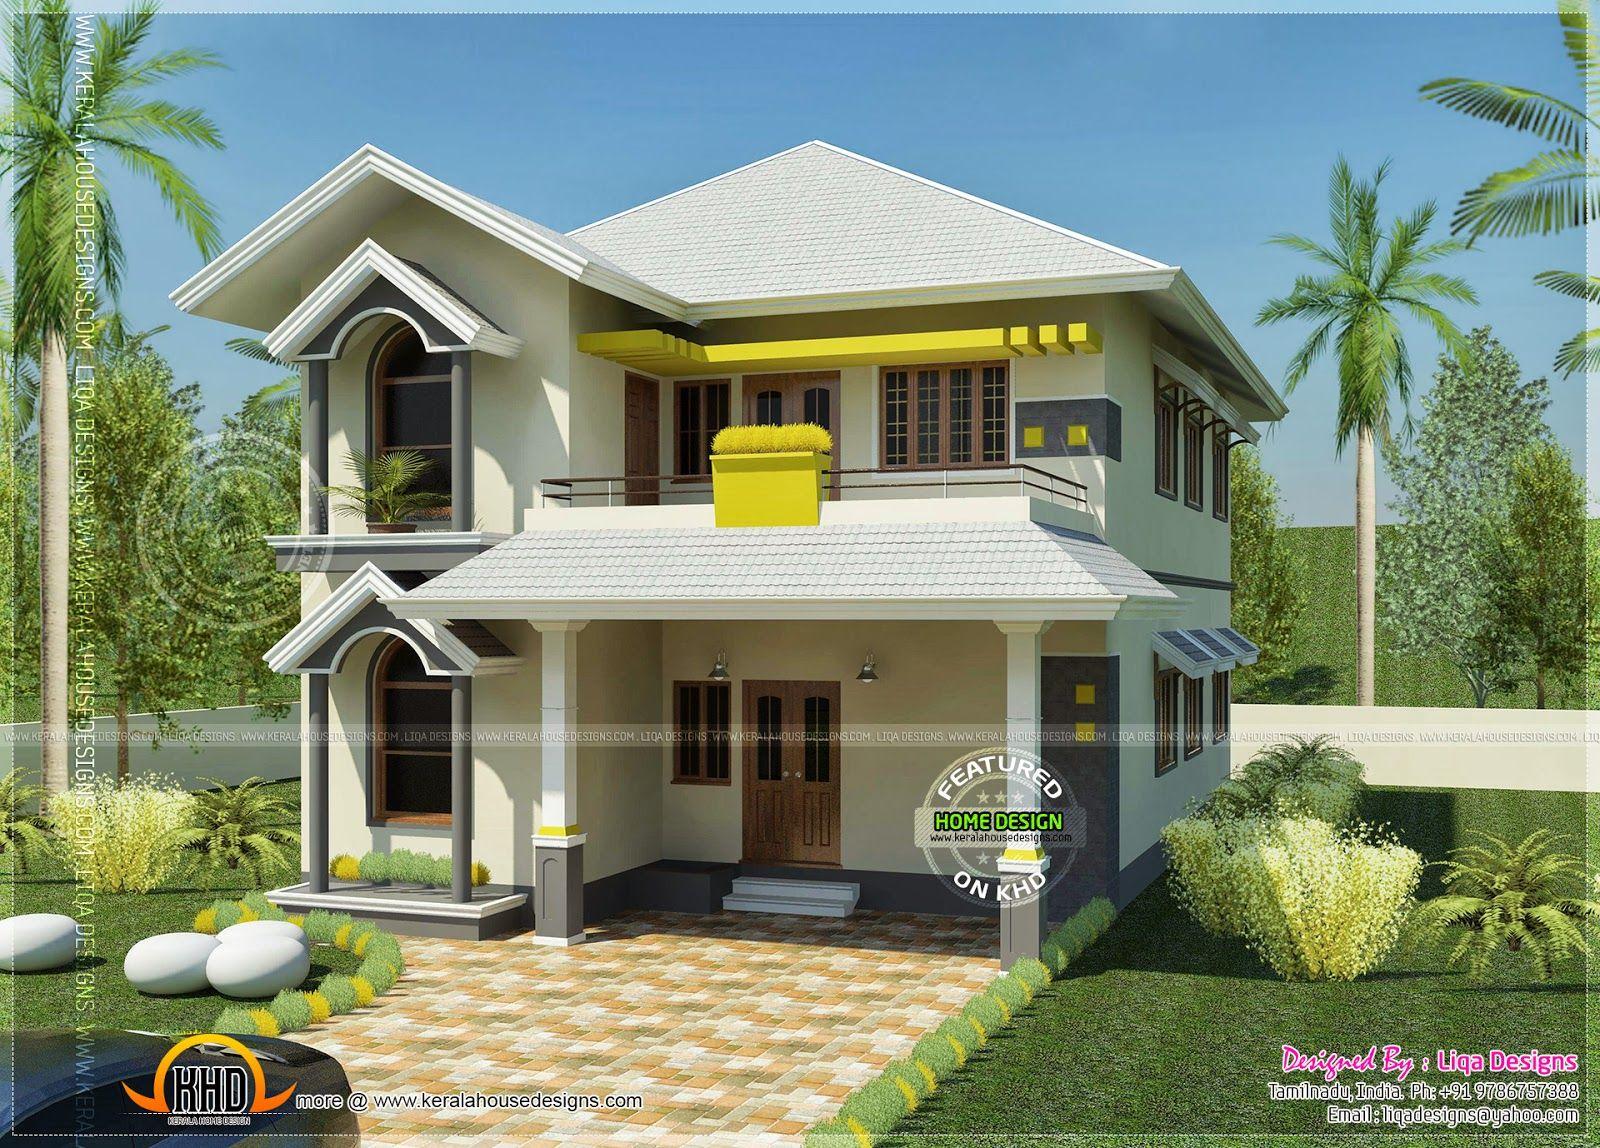 9f65a37f5efa8b5cef326b2269ac313c - 30+ Small House Design Plans In India Pics